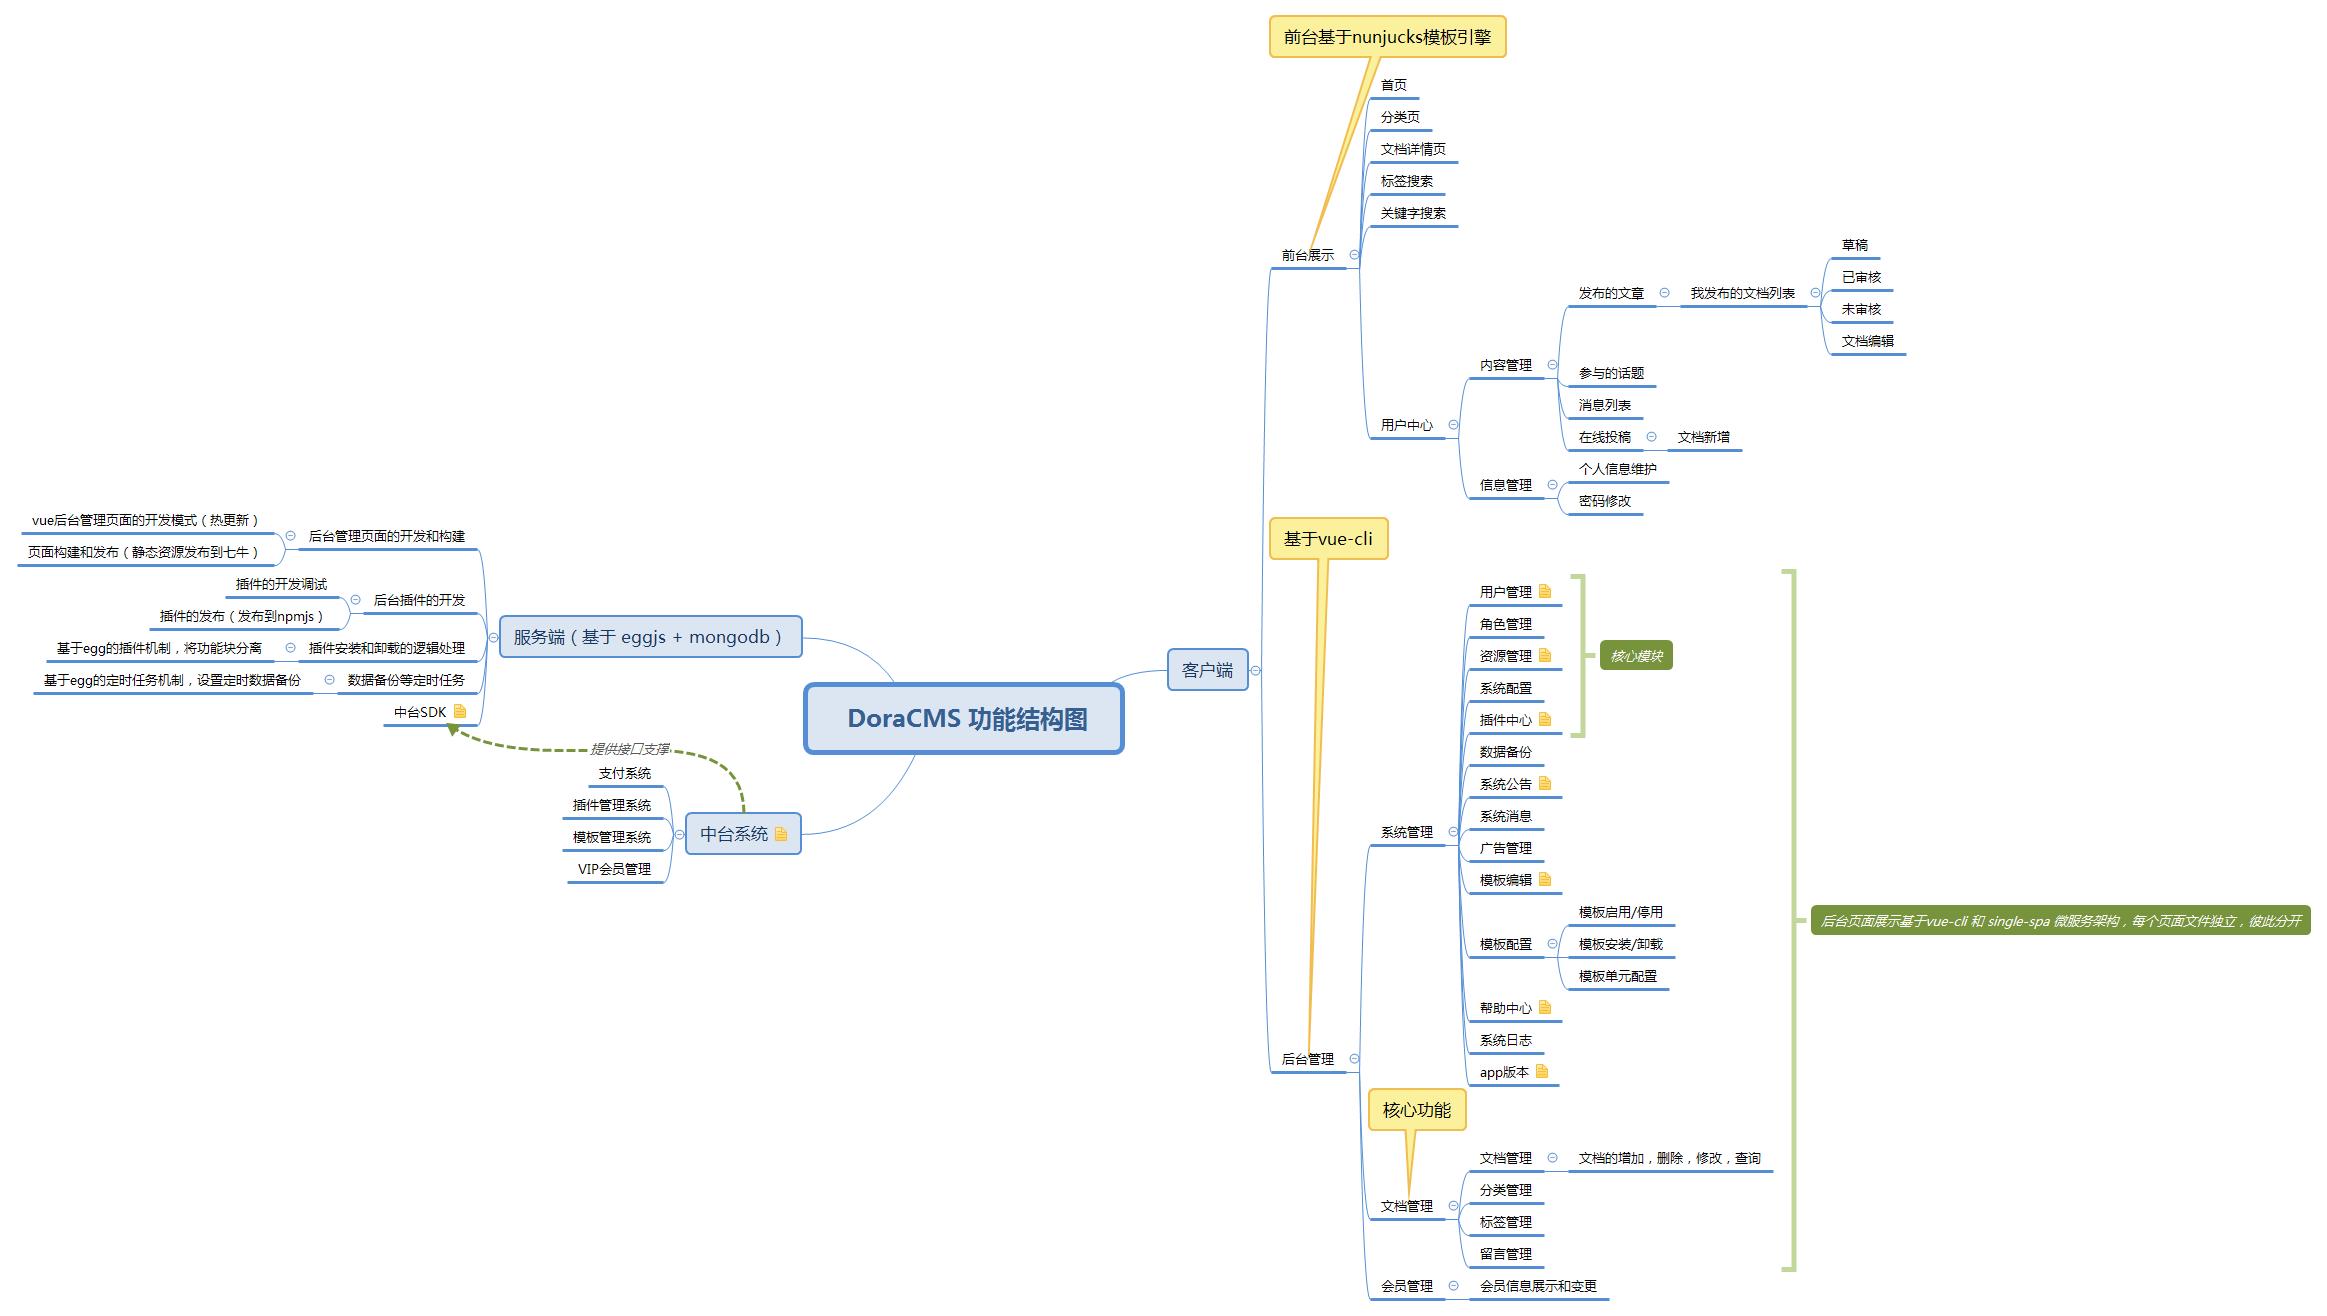 DoraCMS 功能结构图